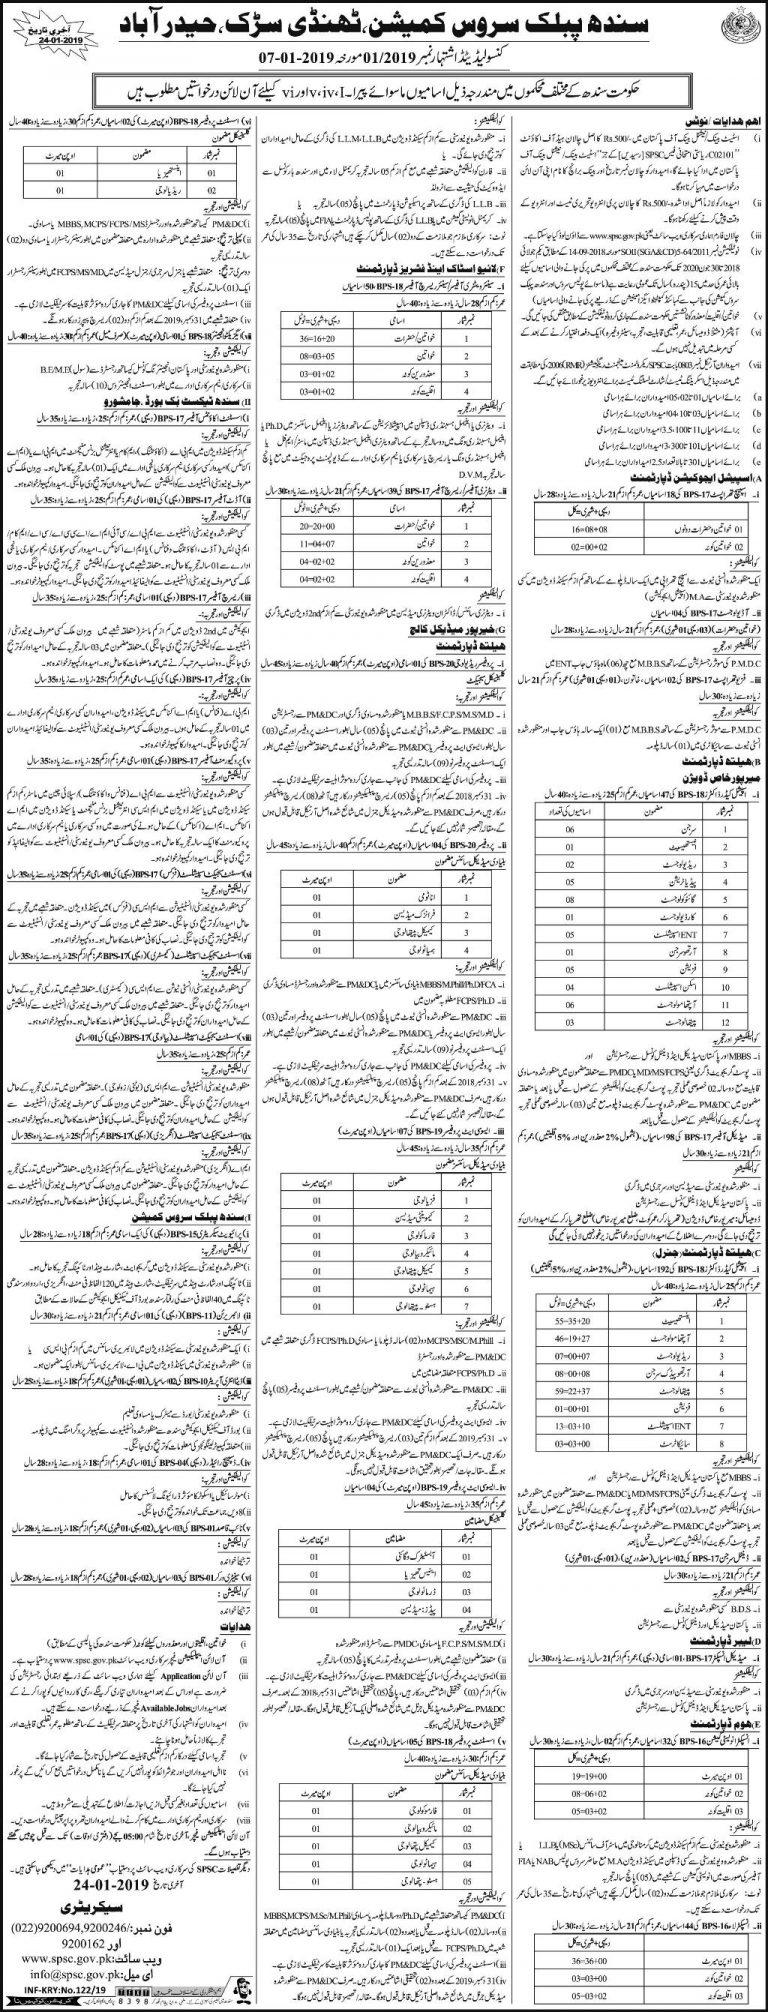 SPSC Jobs 2019 Apply Online Sindh Public Service Commission www.spsc.gov.pk